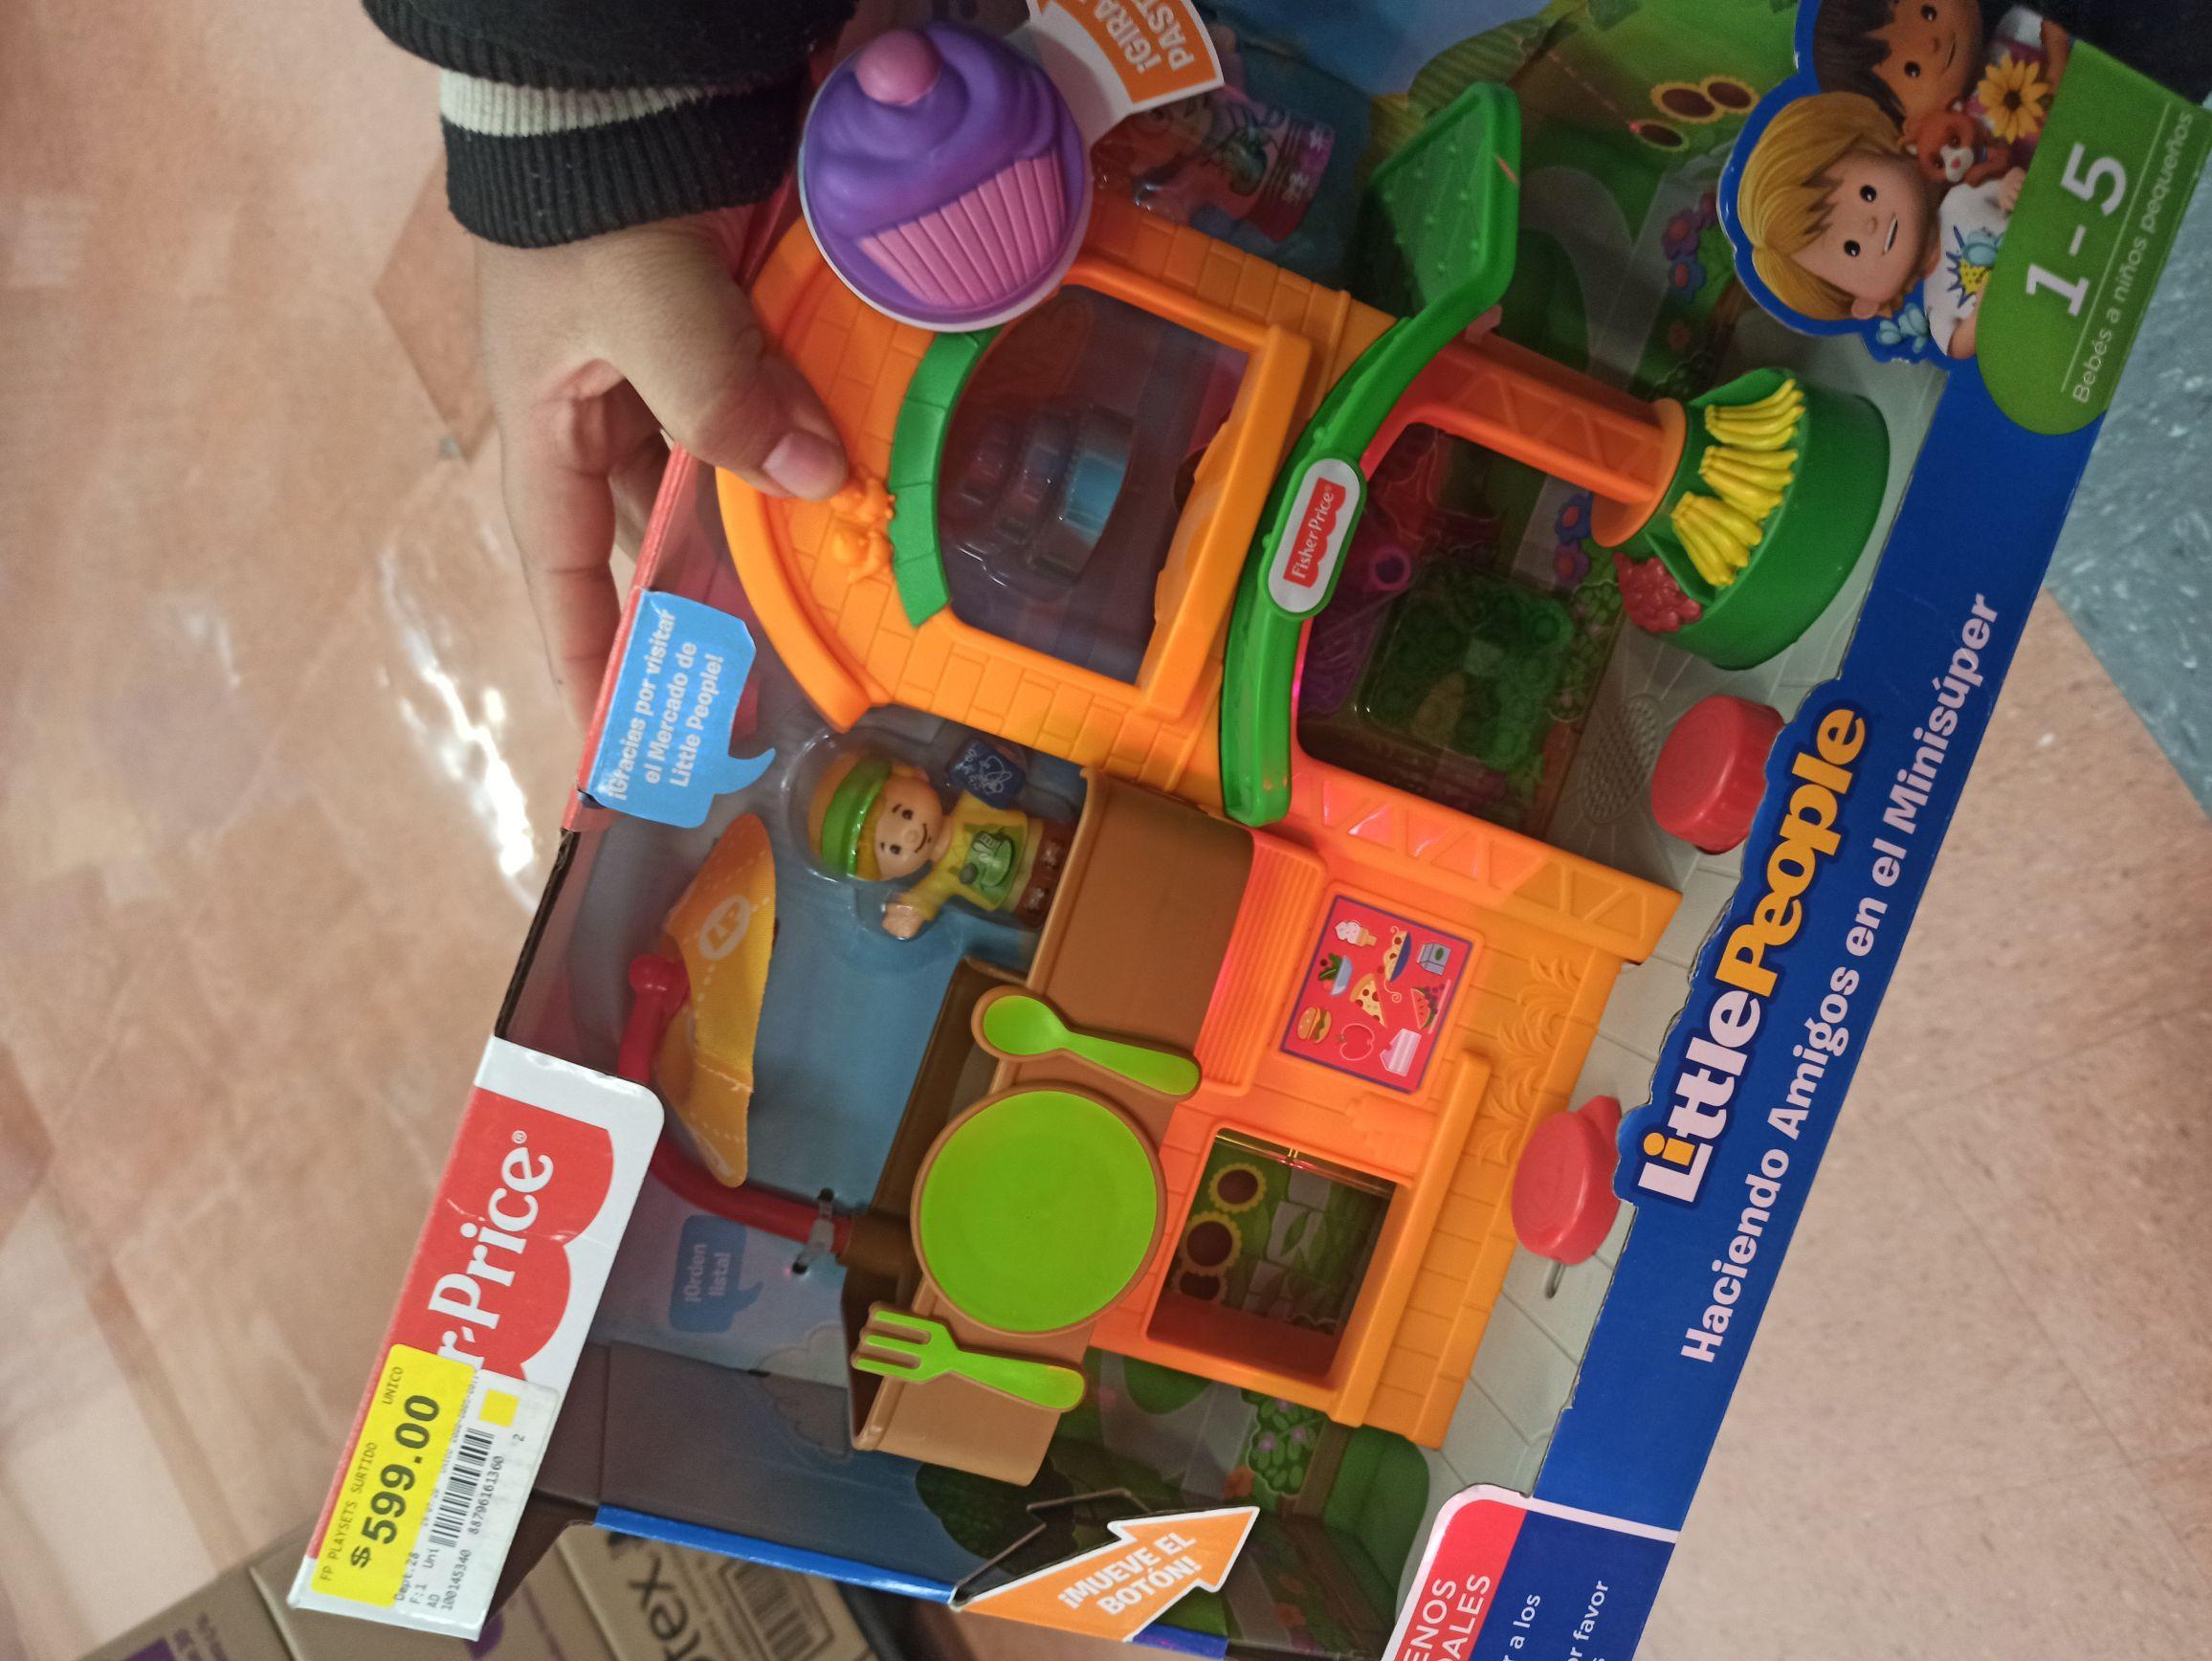 Walmart: Minisuper Little People